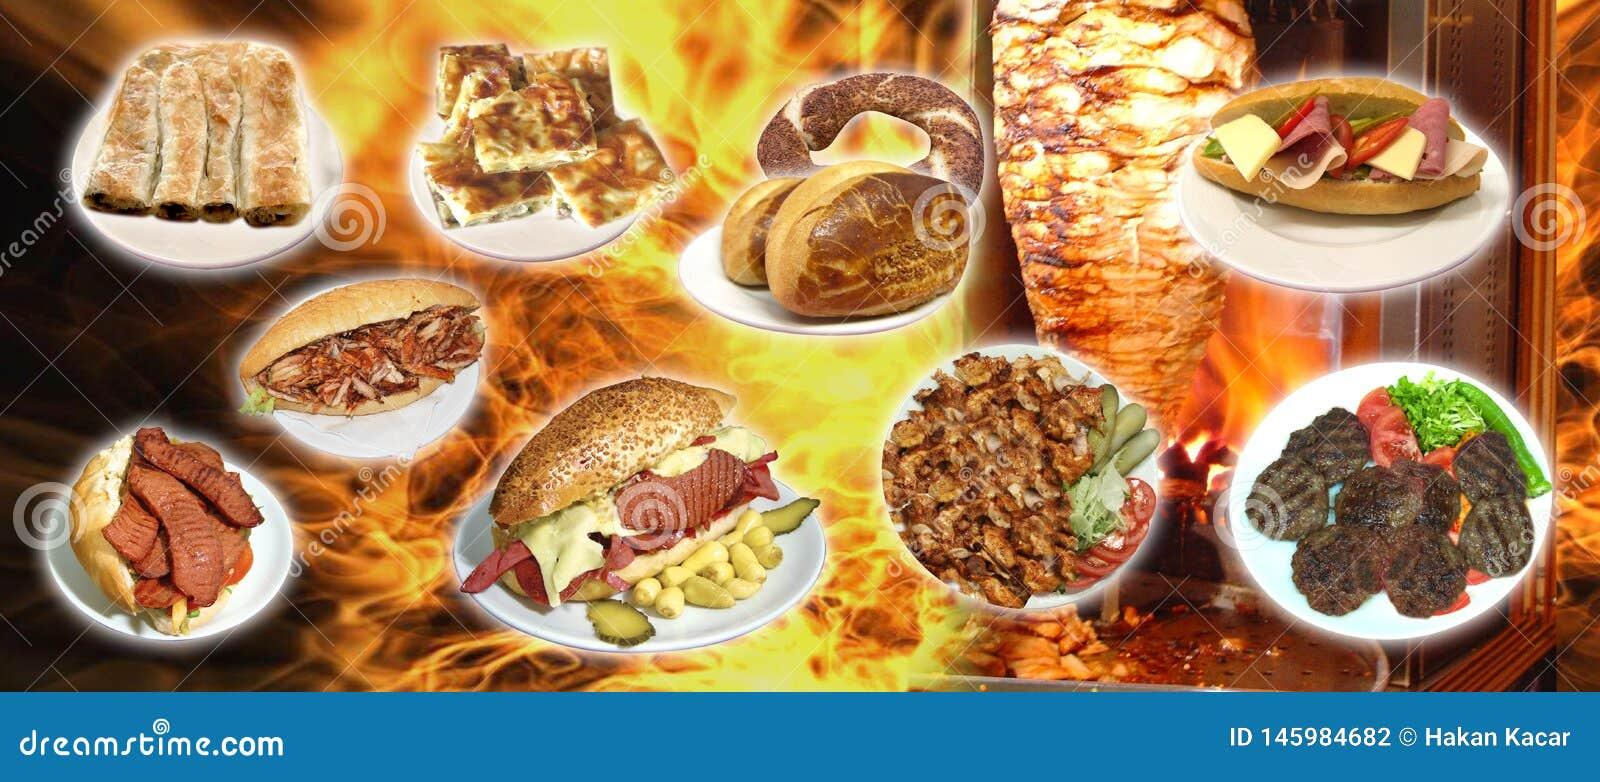 Turkiska foods, turk talar: yemekleri för türk, doner,